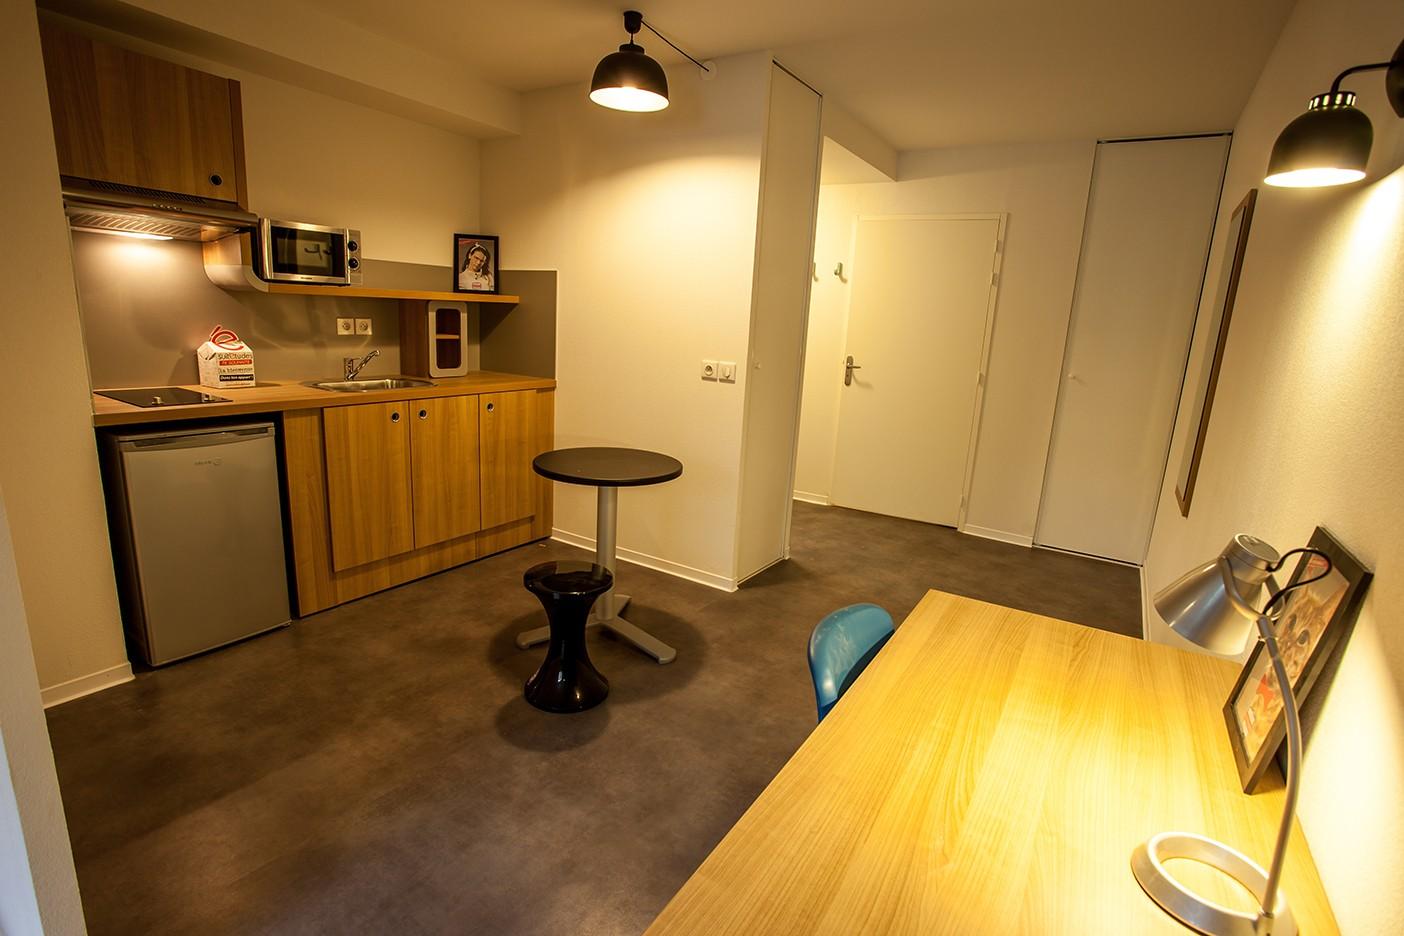 image  2019 06 21 residence etudiante suitetudes residoc 2 montpellier T1 kitchenette